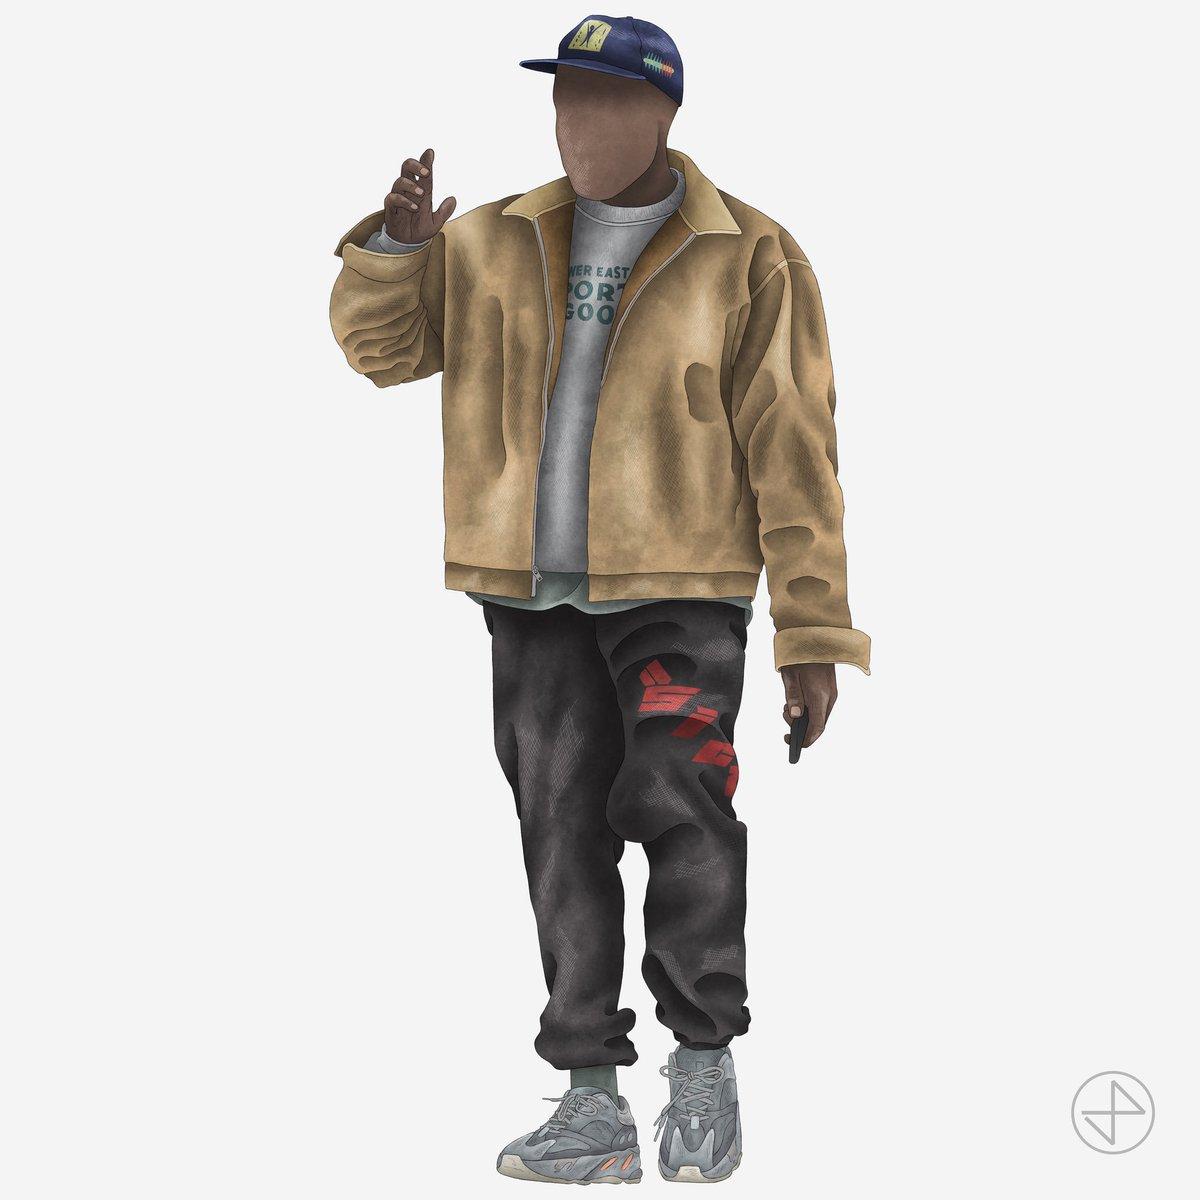 the latest 749f0 1bf72 The last #YEEZYFITOFTHEWEEK in 2018 is ye wearing a ...